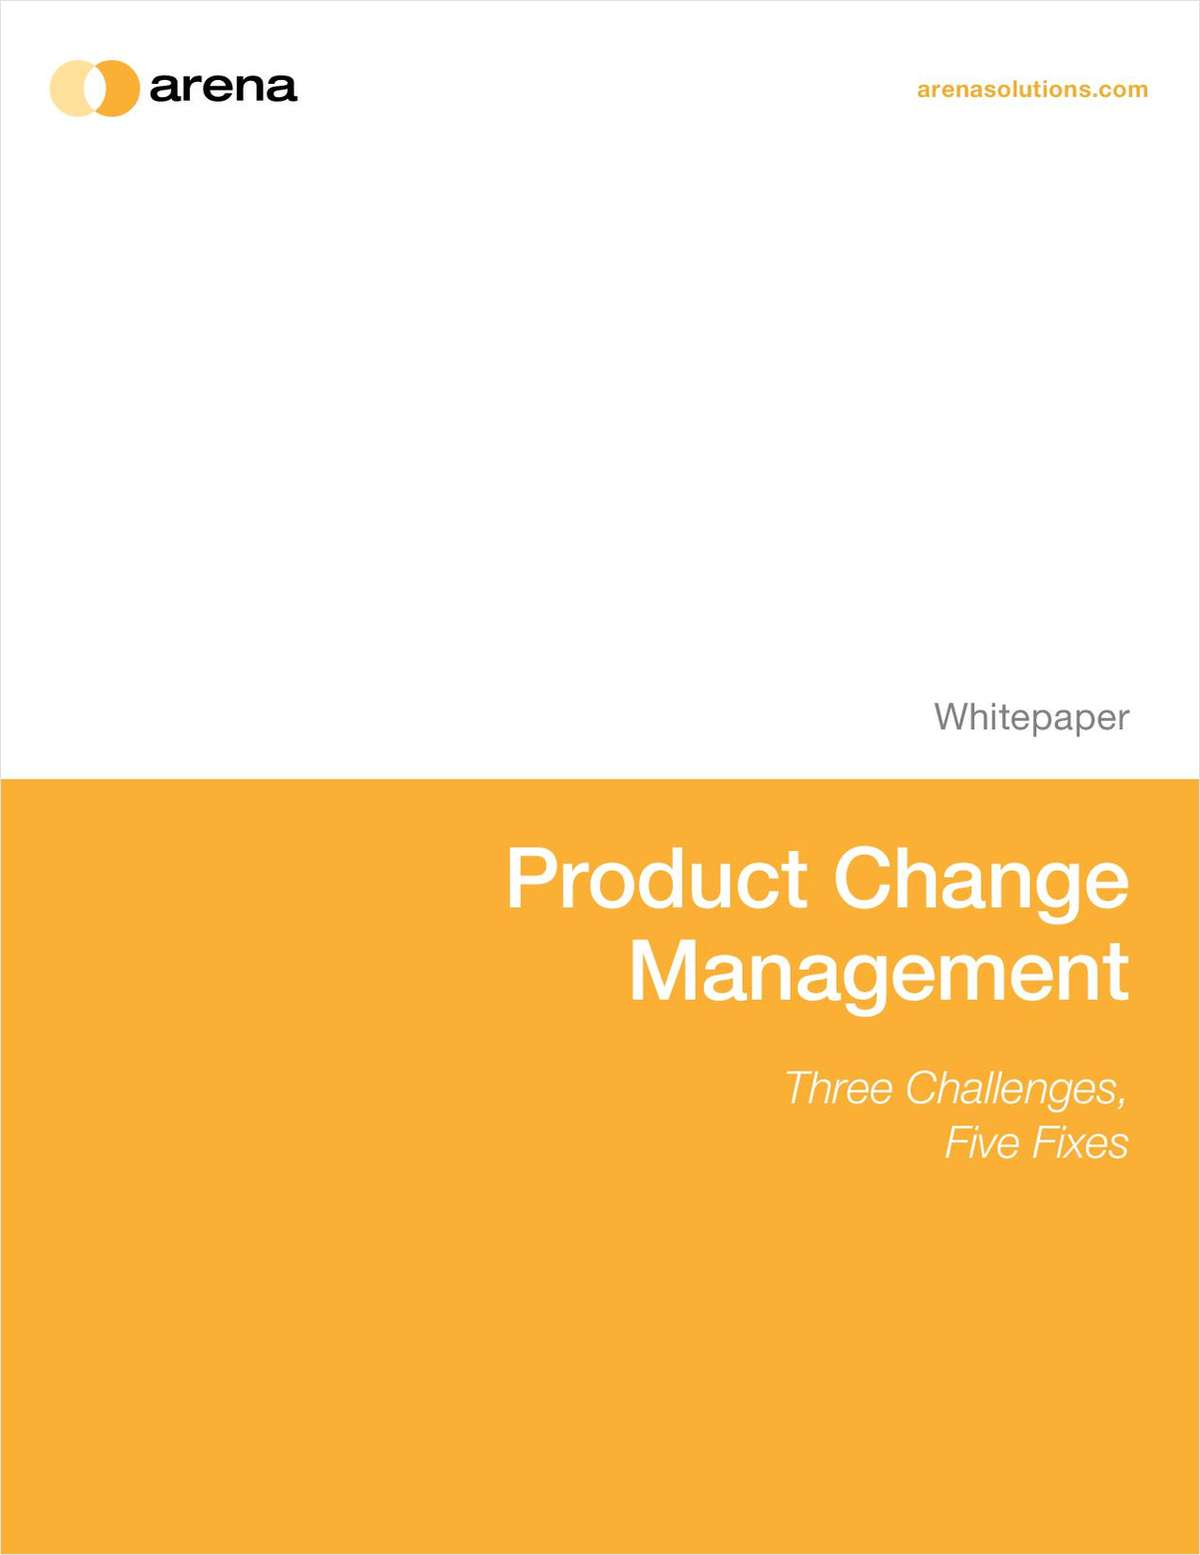 Product Change Management